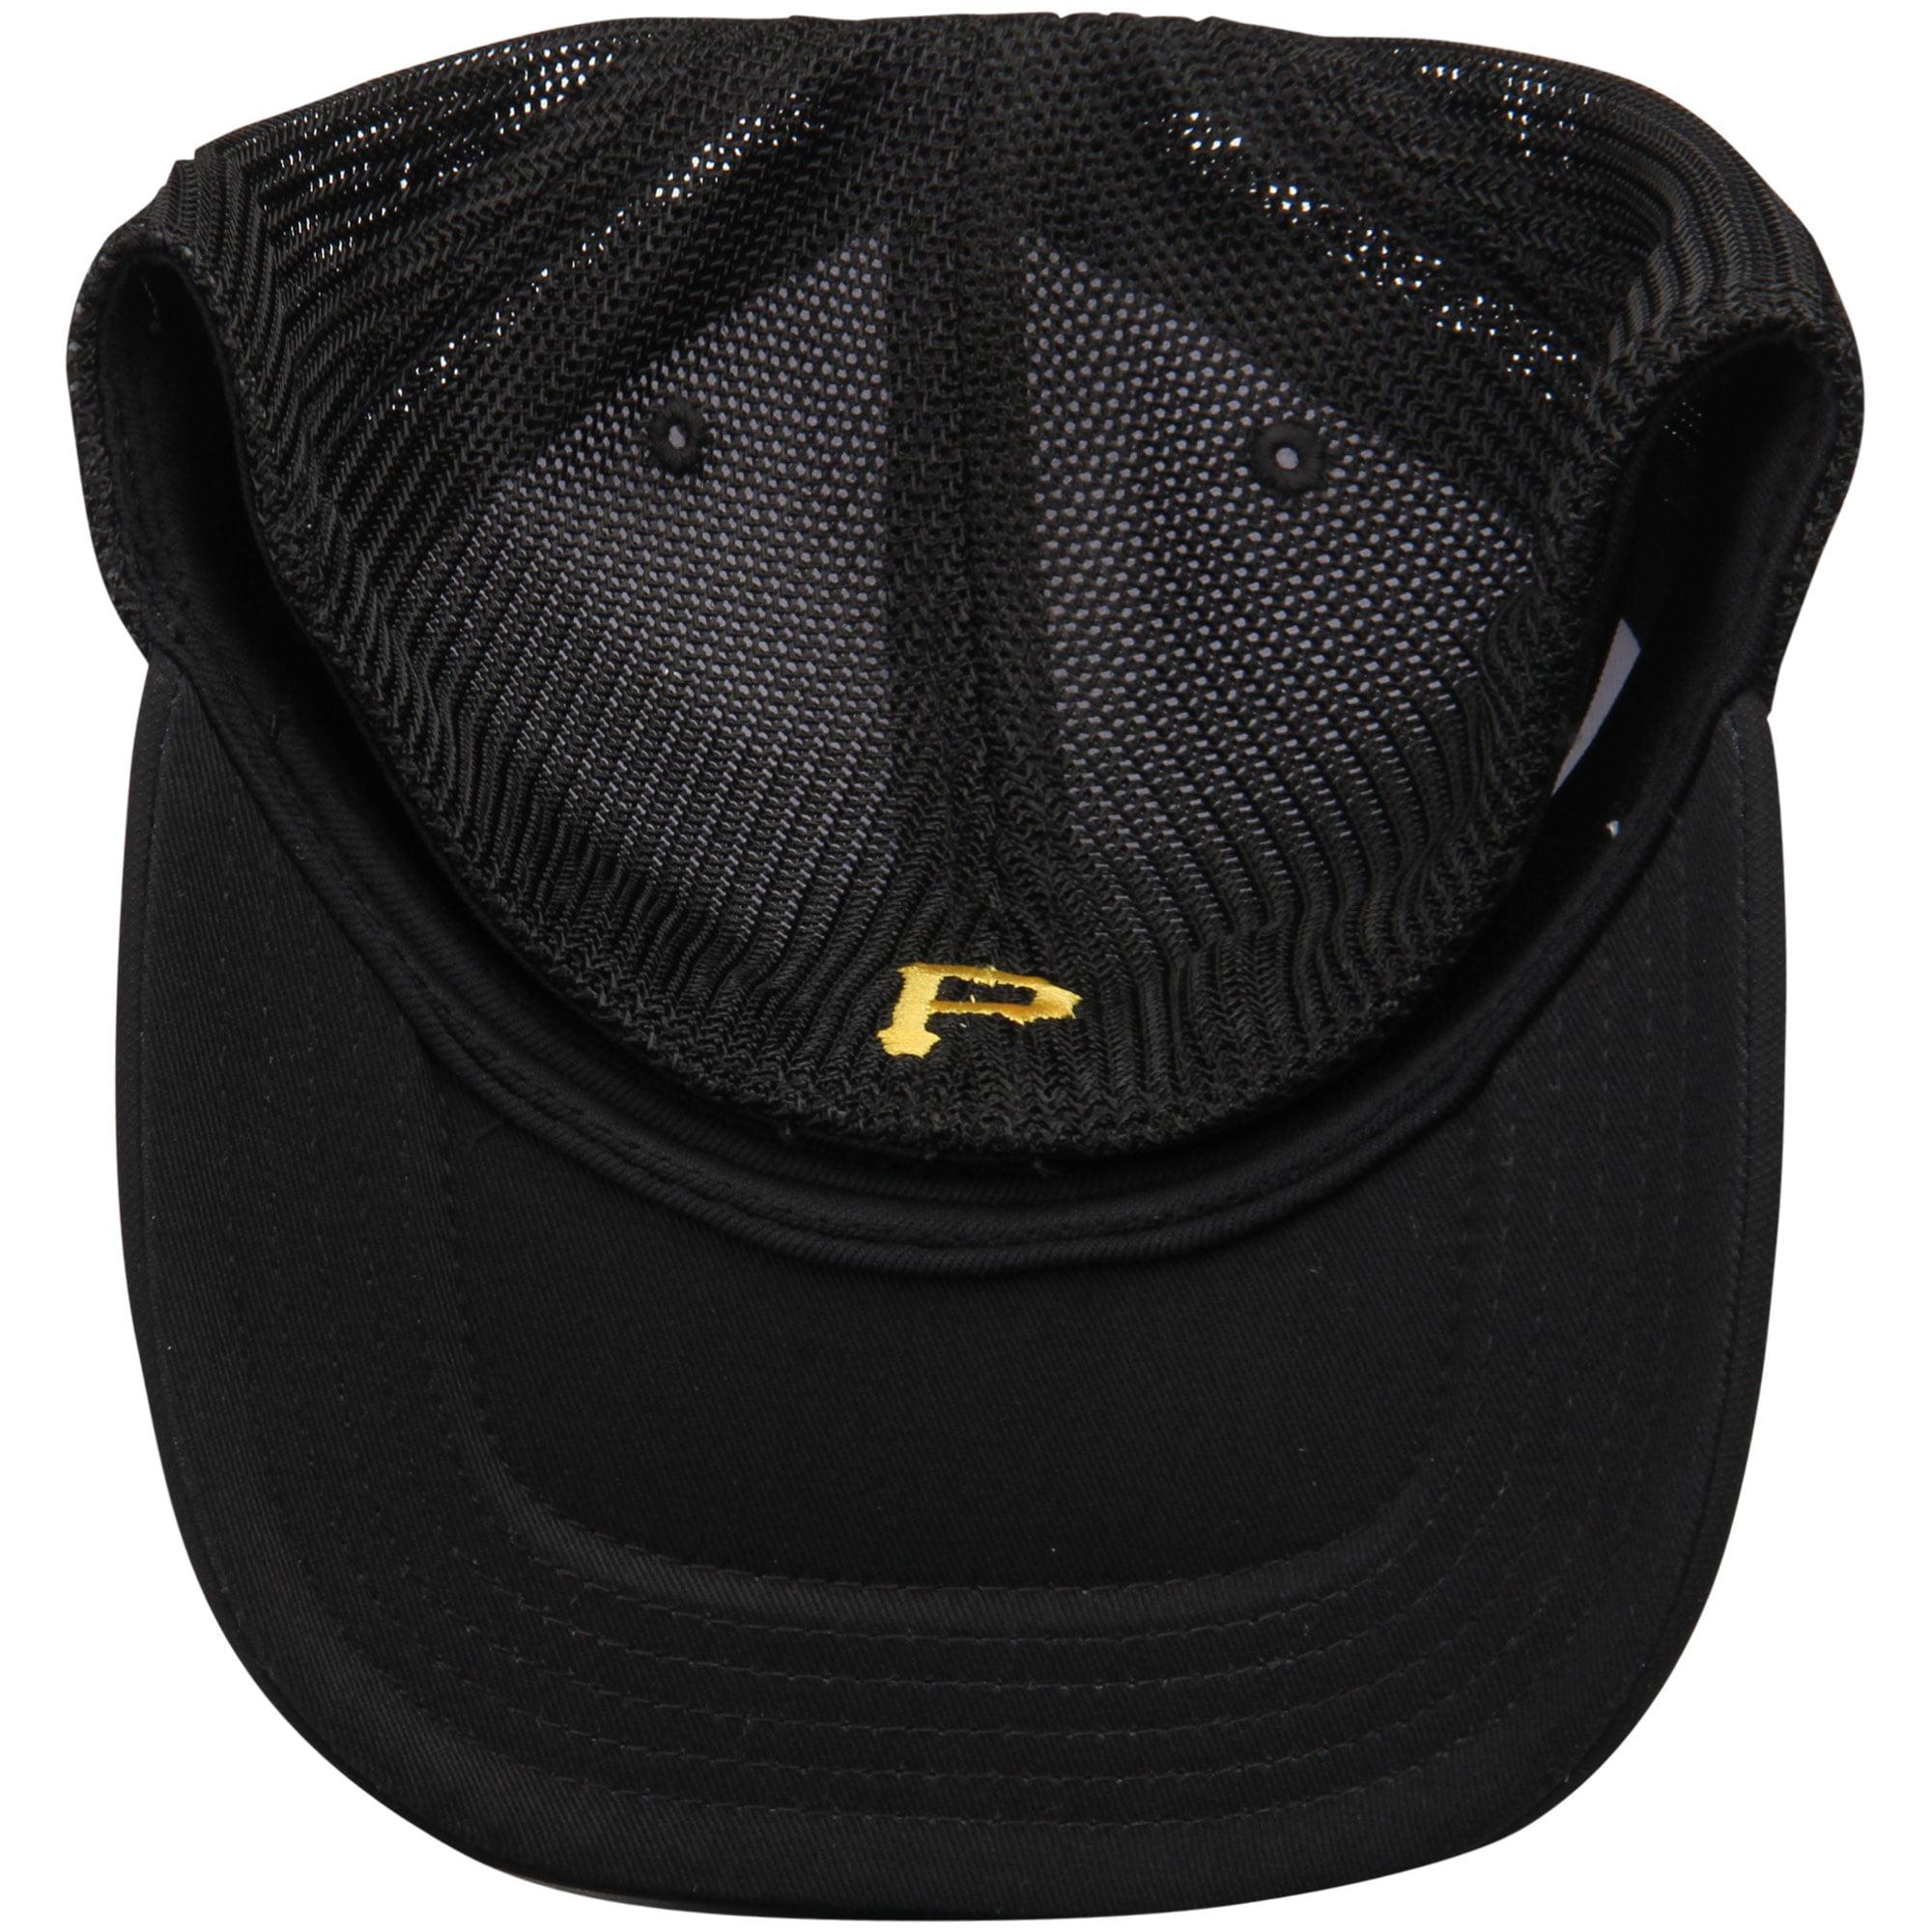 fe95f5b29ca Pittsburgh Pirates Nike Vapor Performance Swoosh Flex Hat - White Black -  Walmart.com